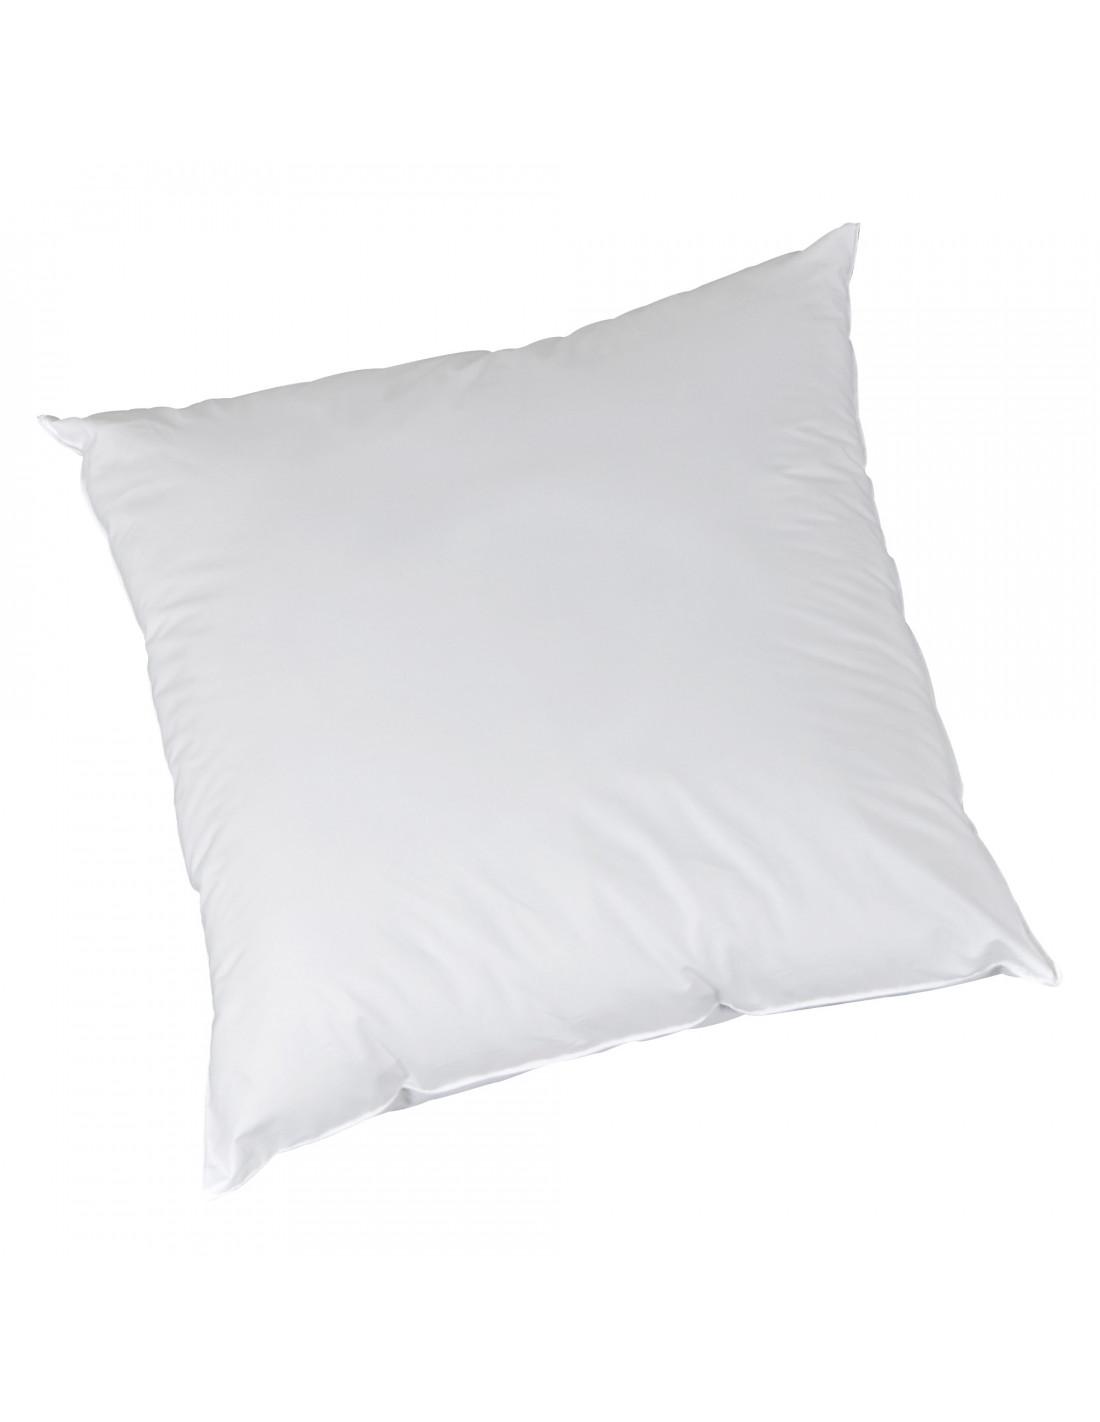 oreiller plumes softyne 30 de lestra noctea. Black Bedroom Furniture Sets. Home Design Ideas